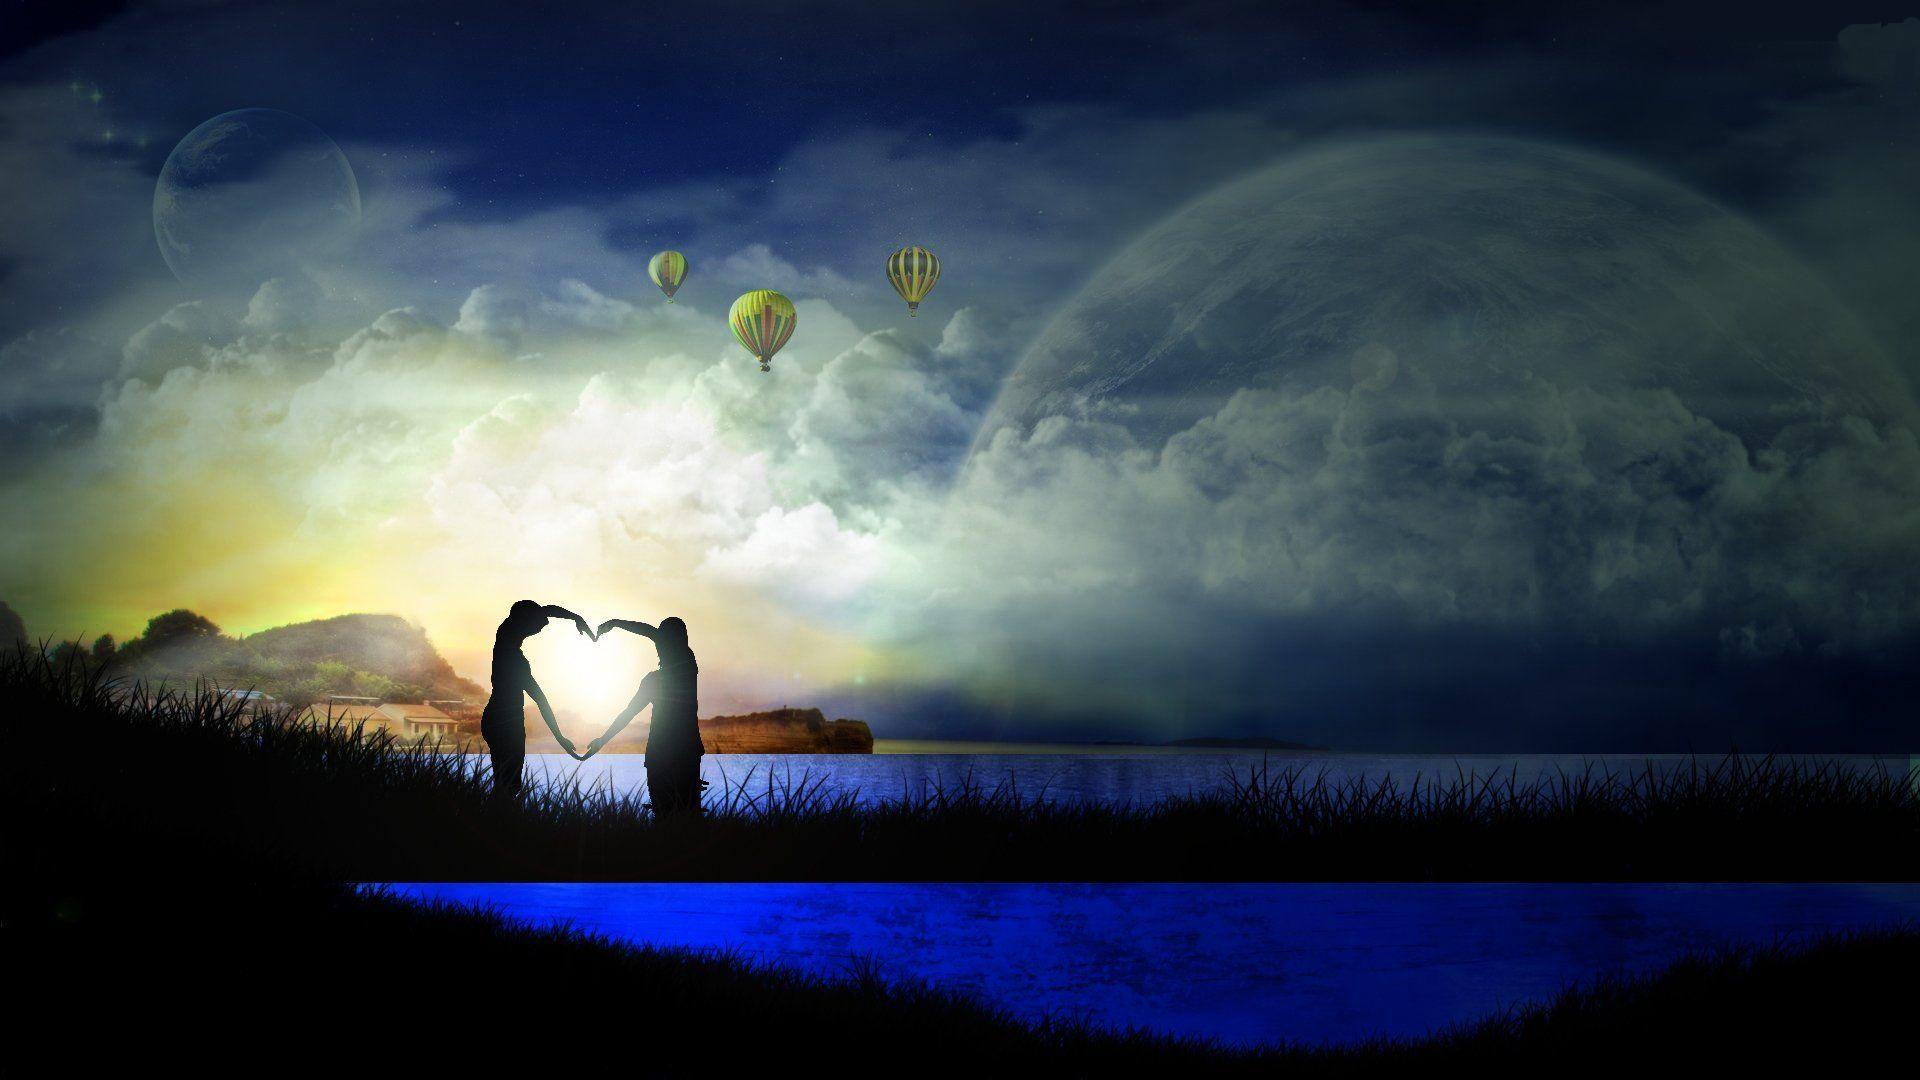 Wallpapers En Hd: Love Wallpapers Hd, Amor Fondos De Pantalla, Love 3D